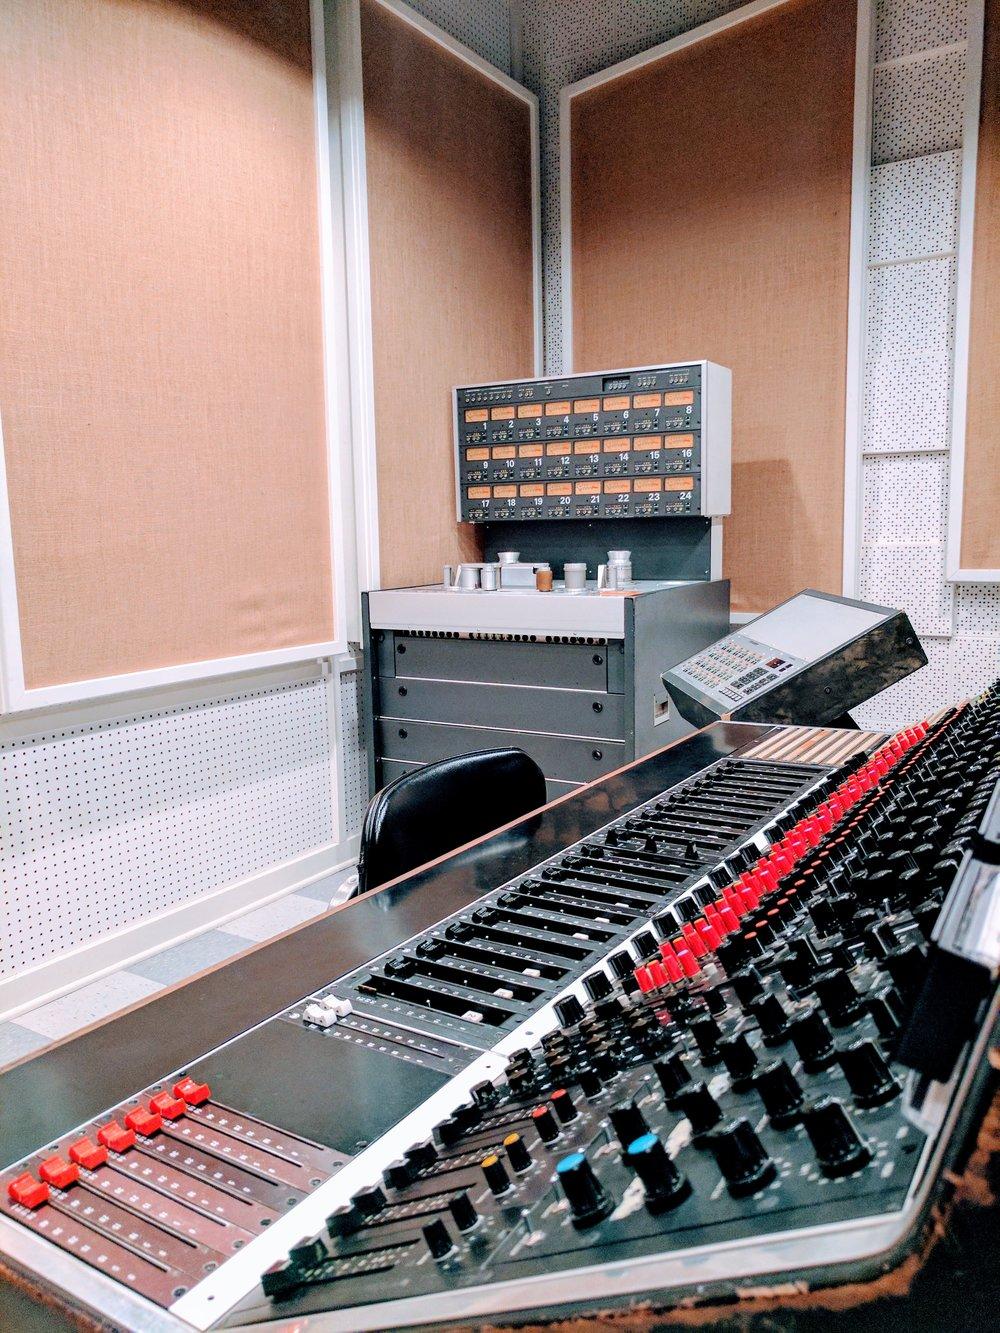 Control B Helios Studer Tape Machine.jpg